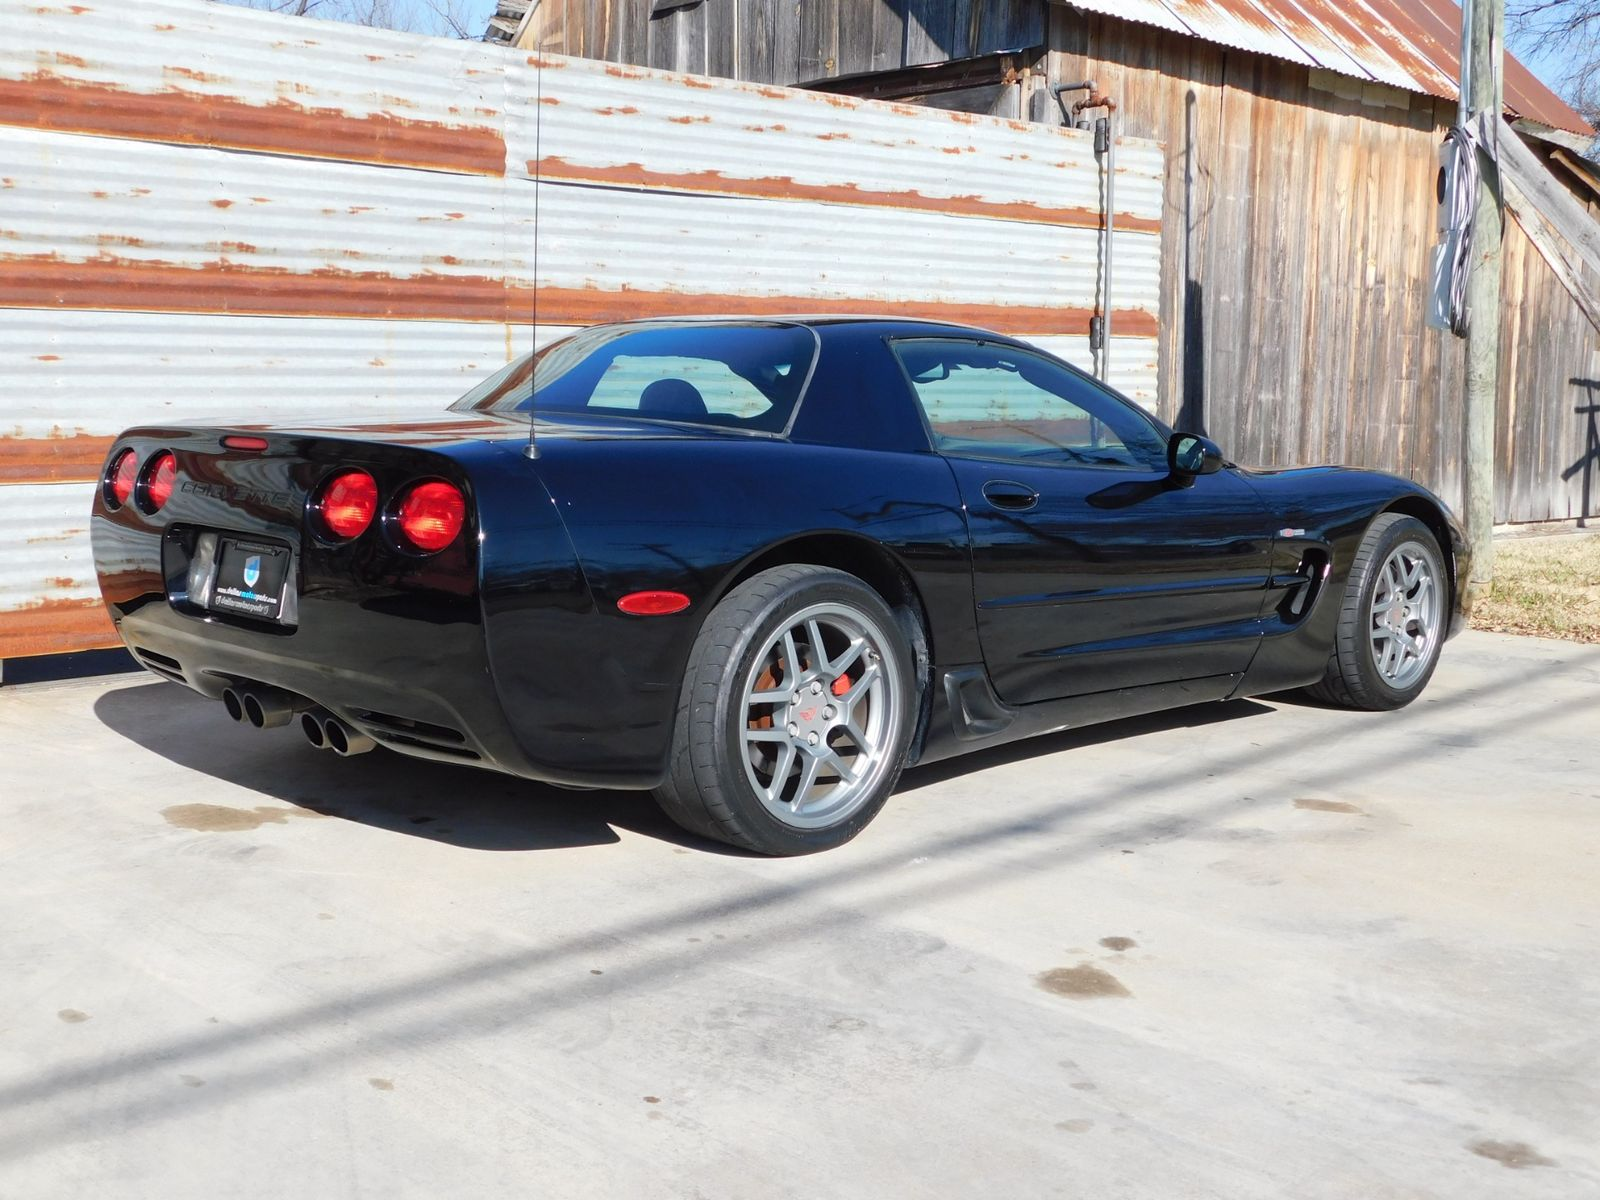 2002 Chevrolet Corvette Z06 city TX Dallas Motorsports